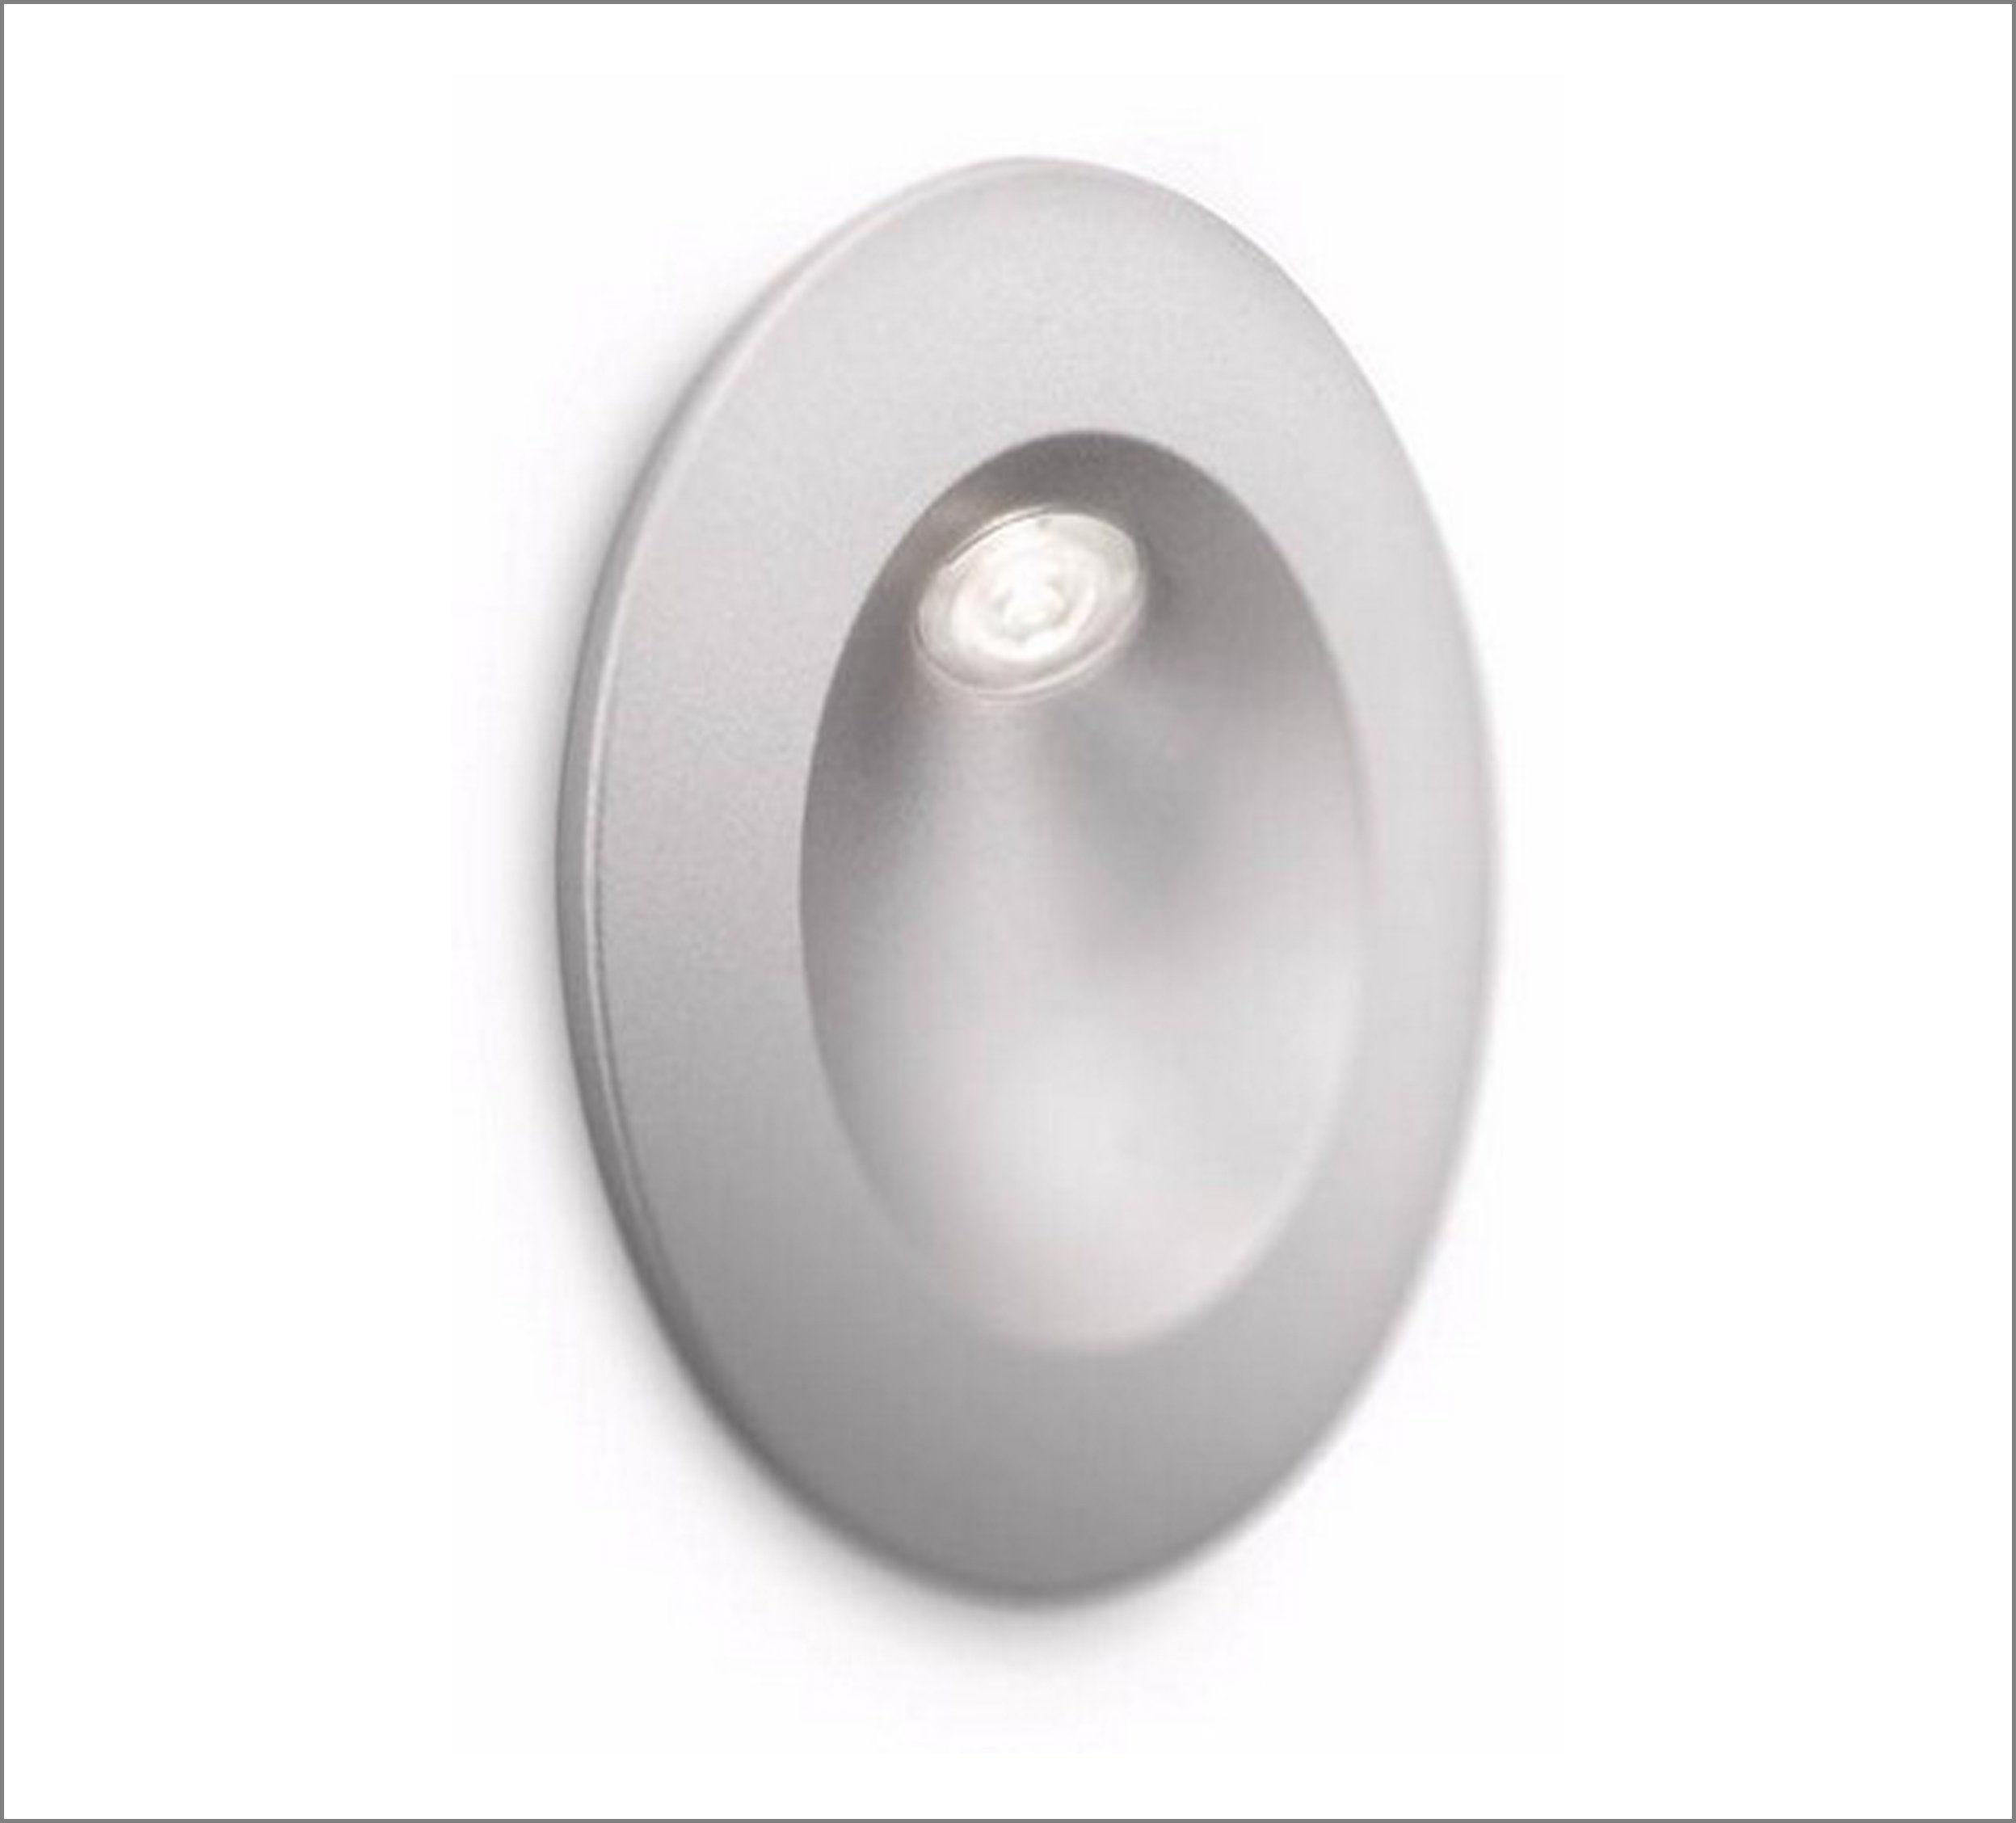 PHILIPS SYRMA 57993/48/16 lampa wpust LED